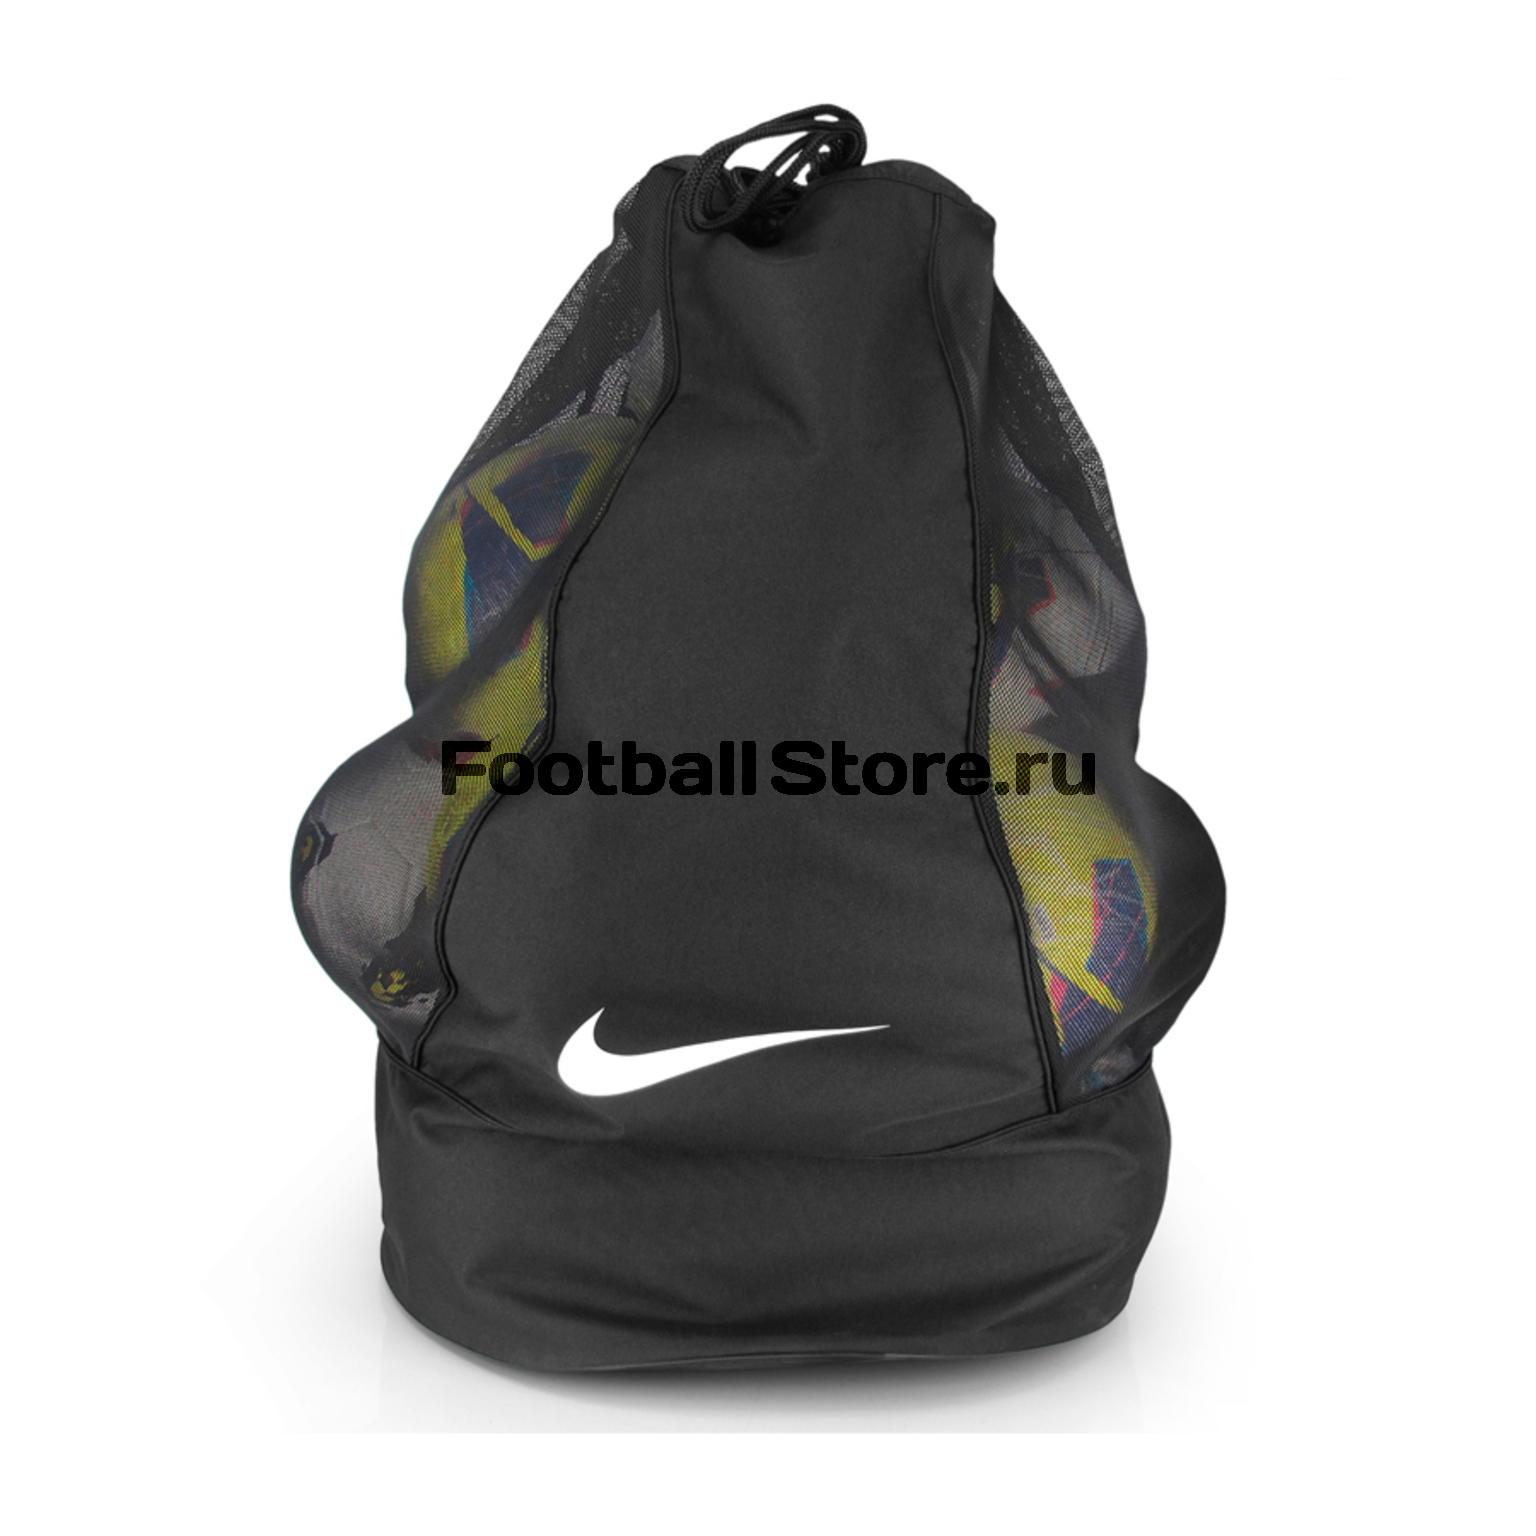 Сумки/Рюкзаки Nike Сумка для мячей Nike Club Team Bag 2.0 BA4534-067